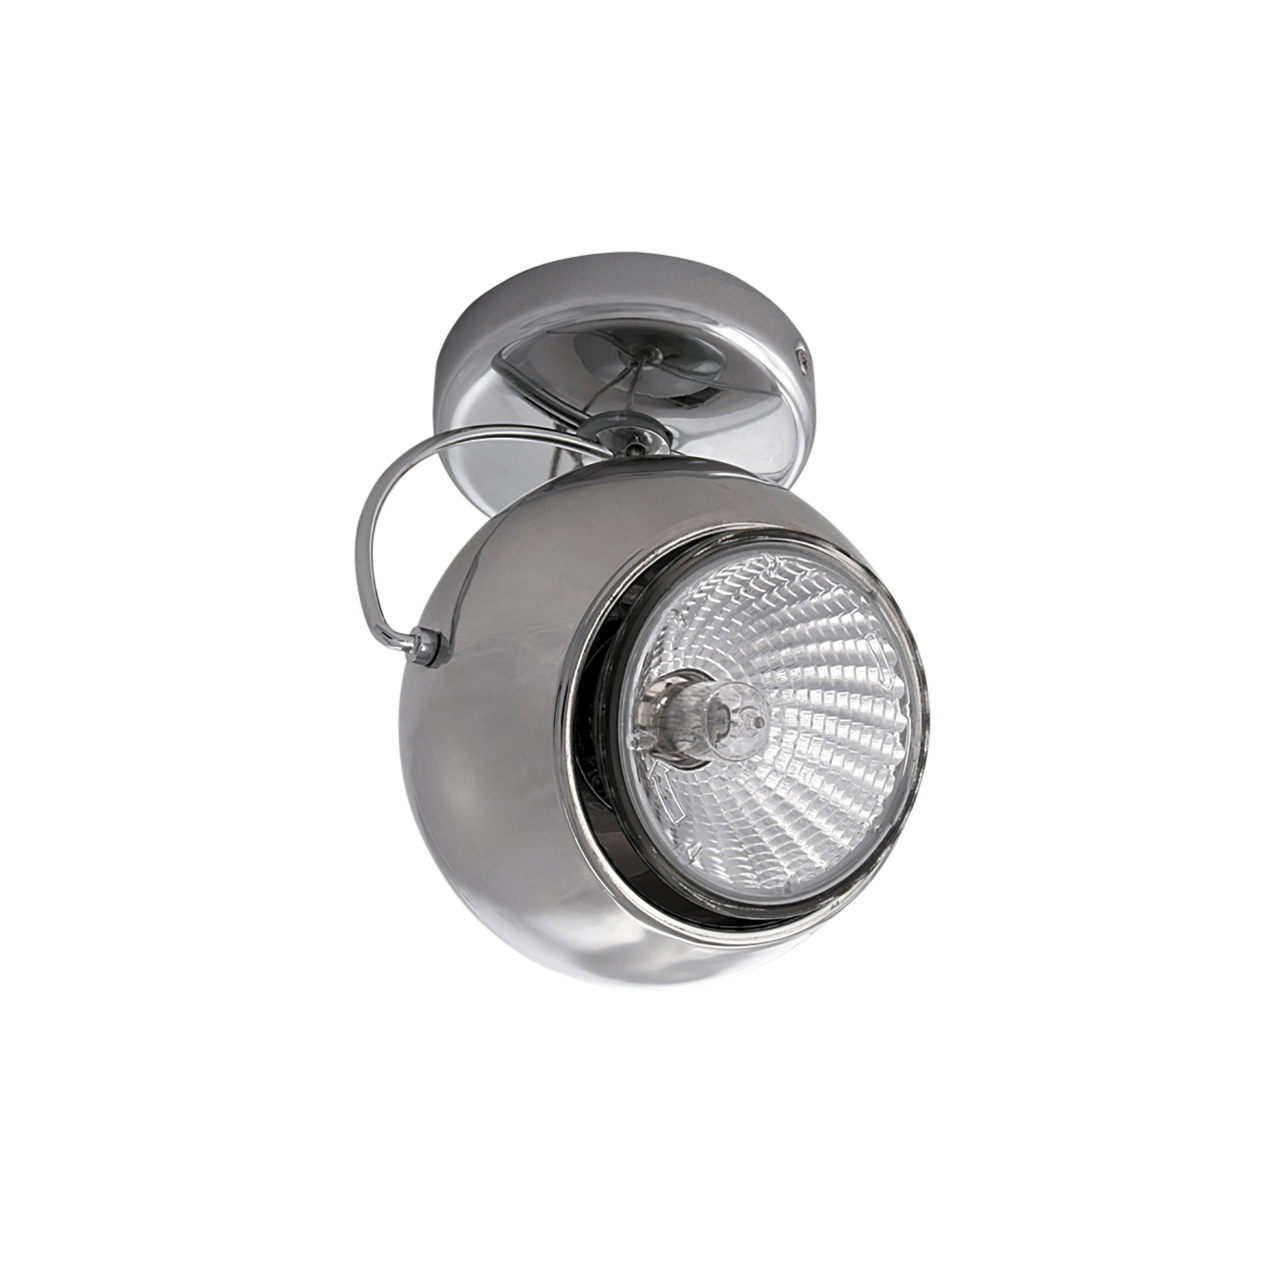 Светильник Occhio fabi Riflesso HP16 хром / хром Lightstar 110544